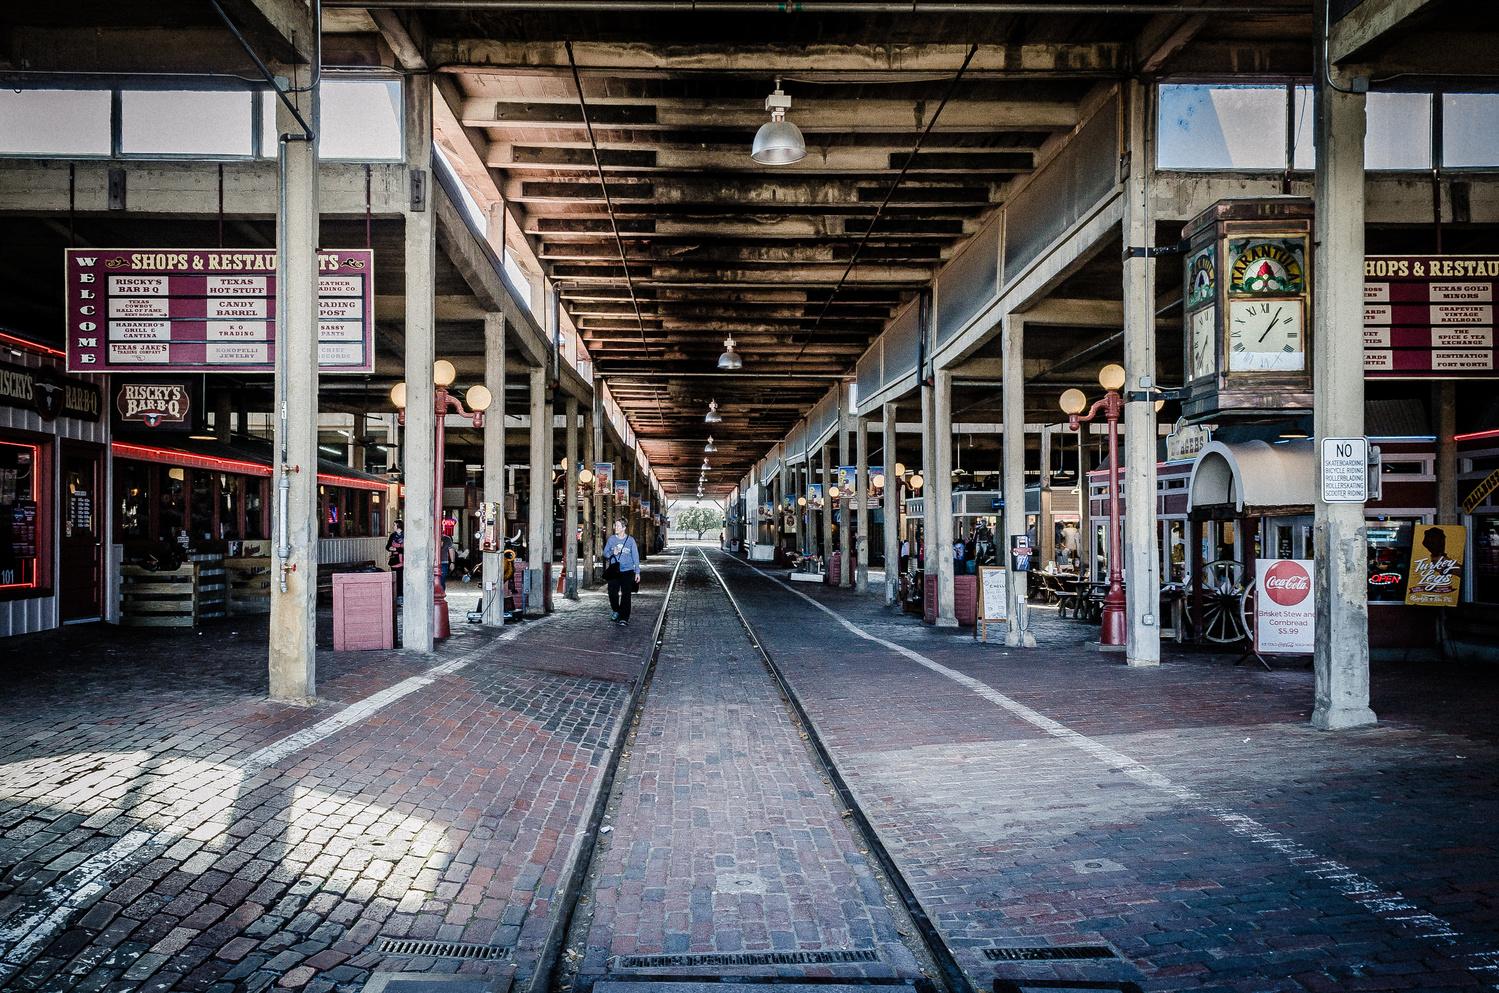 Fort Worth Stockyards Station by Roger Lorenz